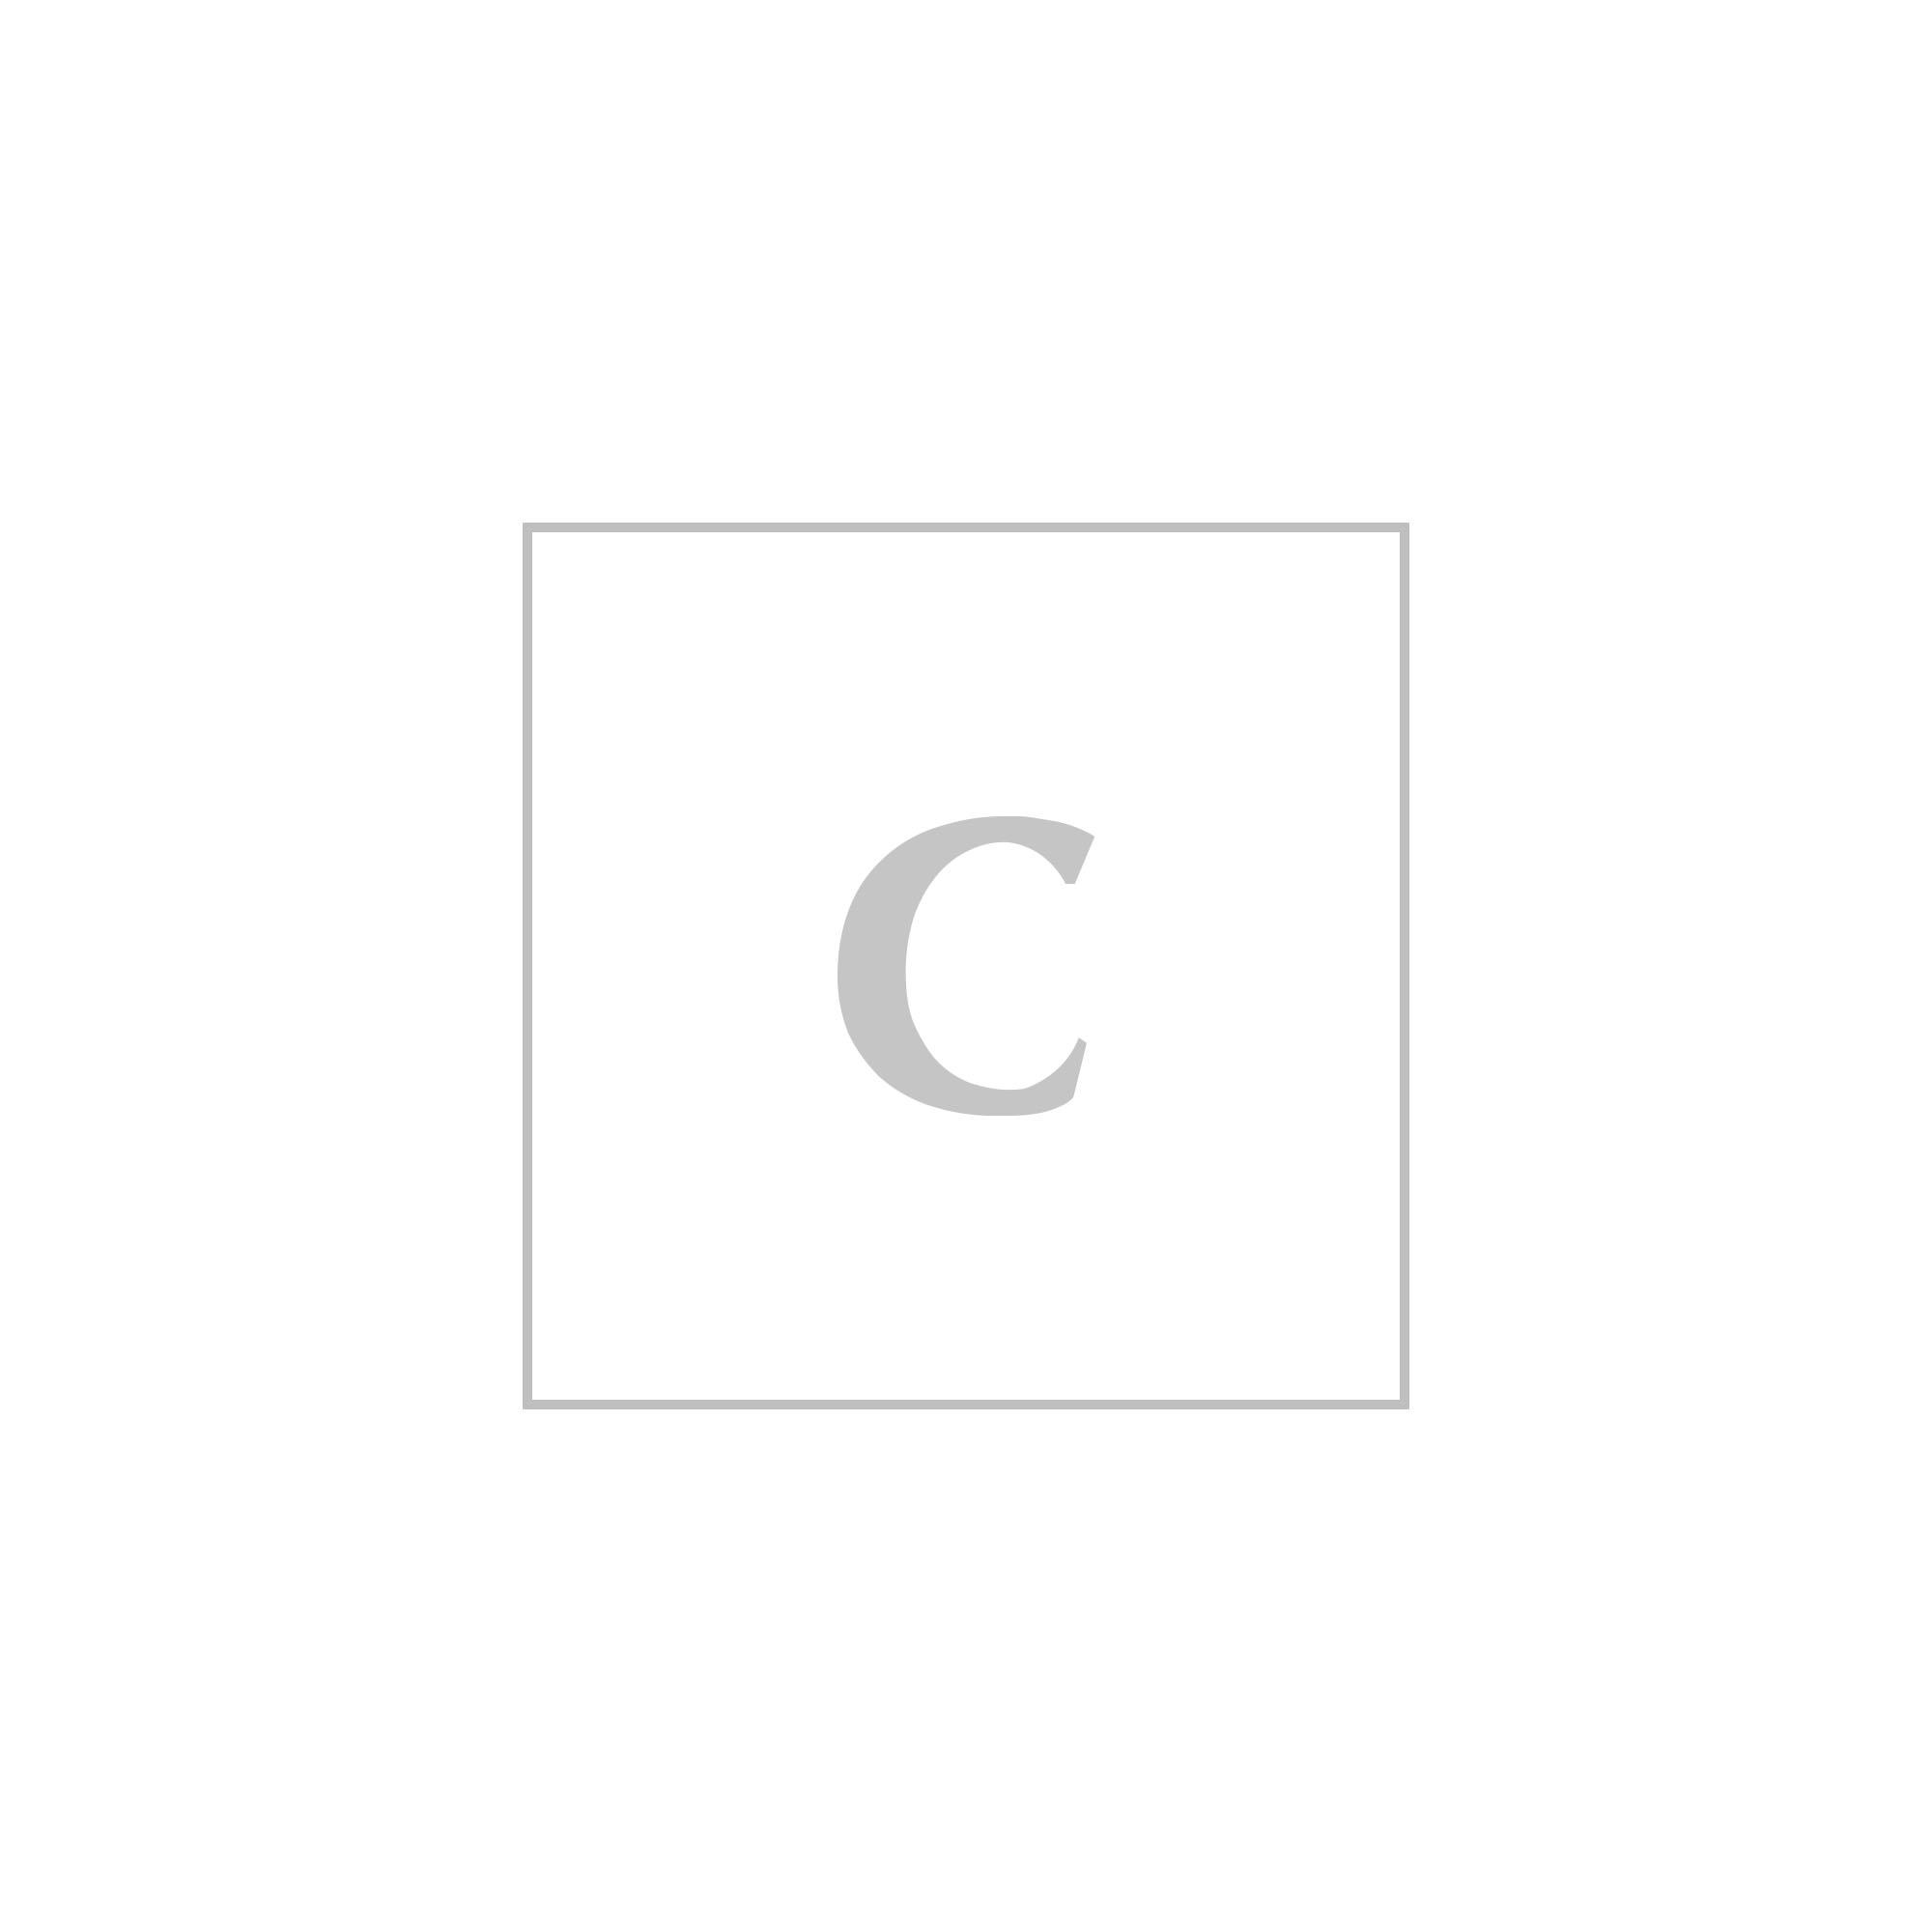 Stella mccartney clutch falabella